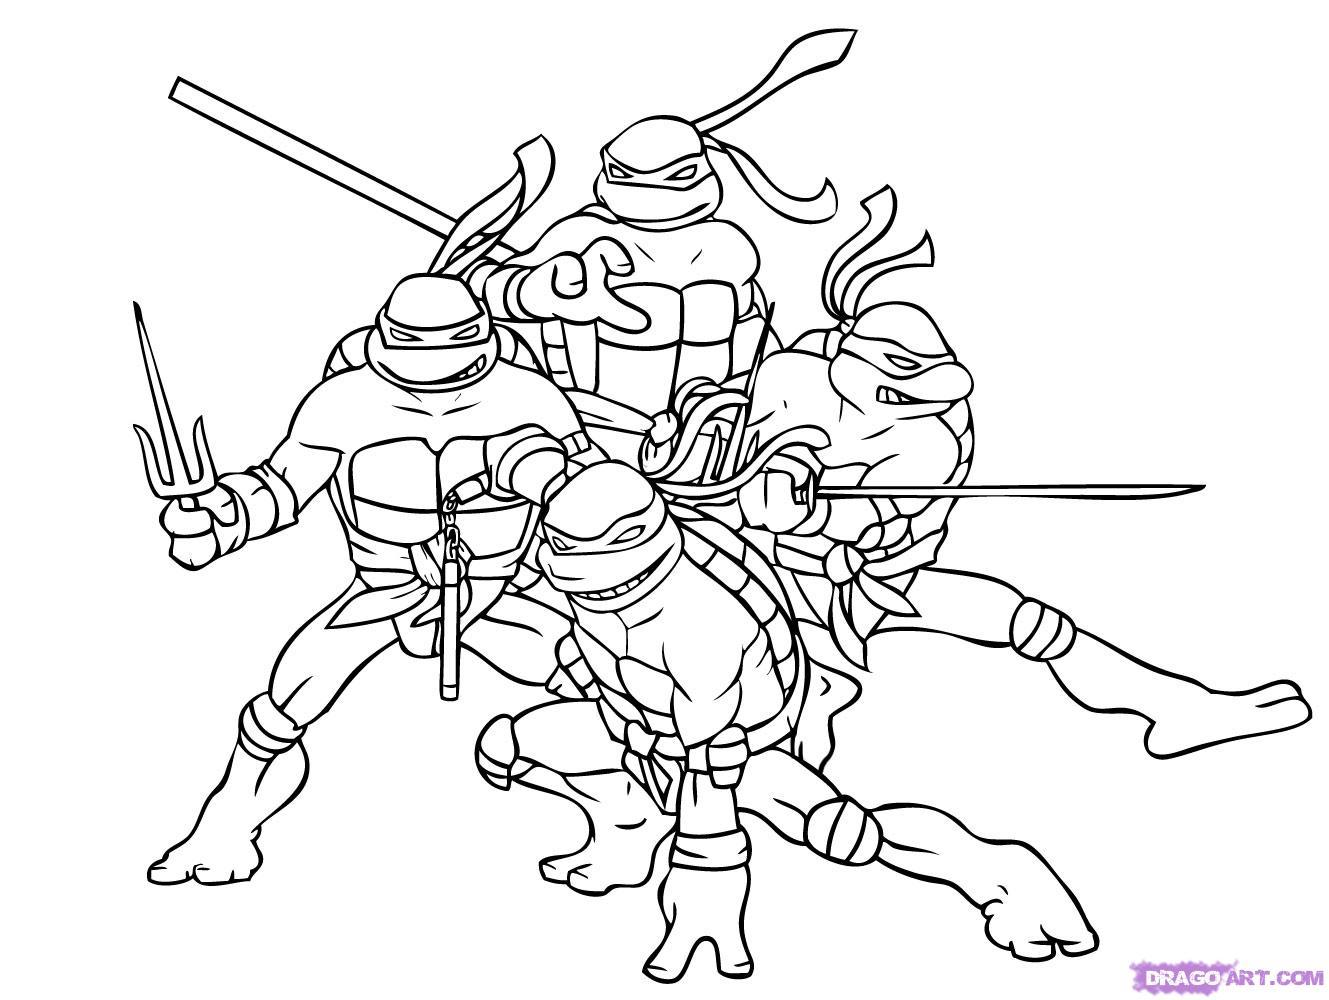 Coloring Pages For Teenage Mutant Ninja Turtles At Getdrawings Com